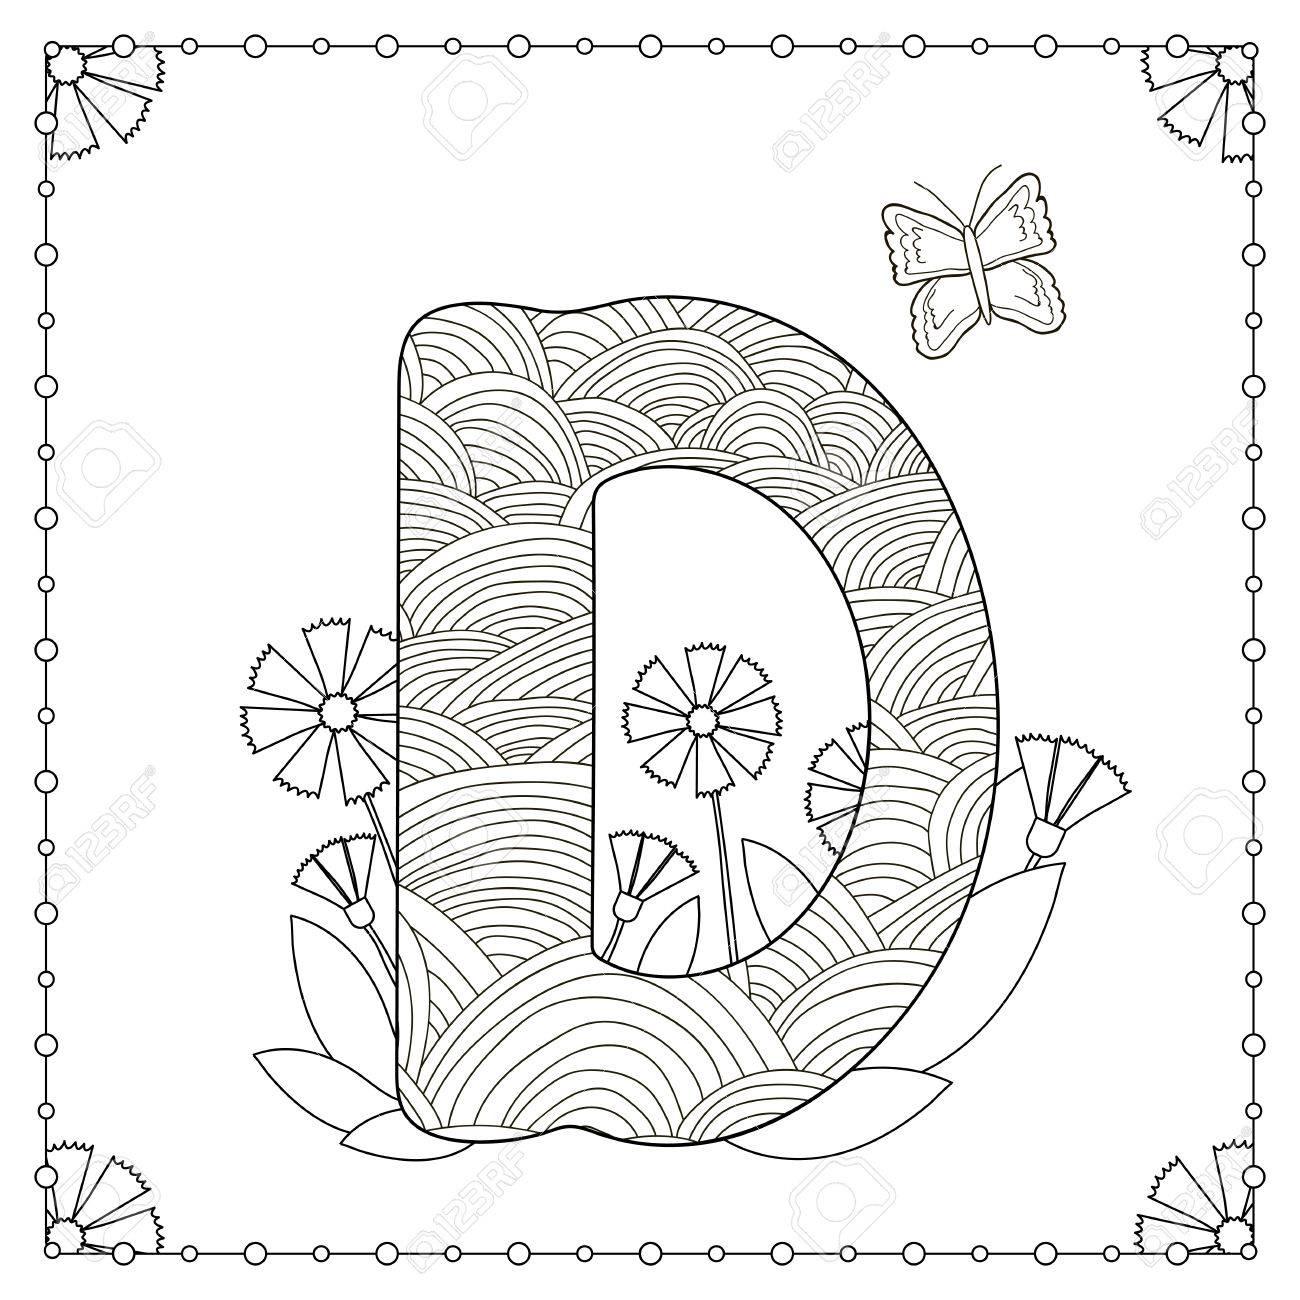 Alphabet Coloring Page Capital Letter